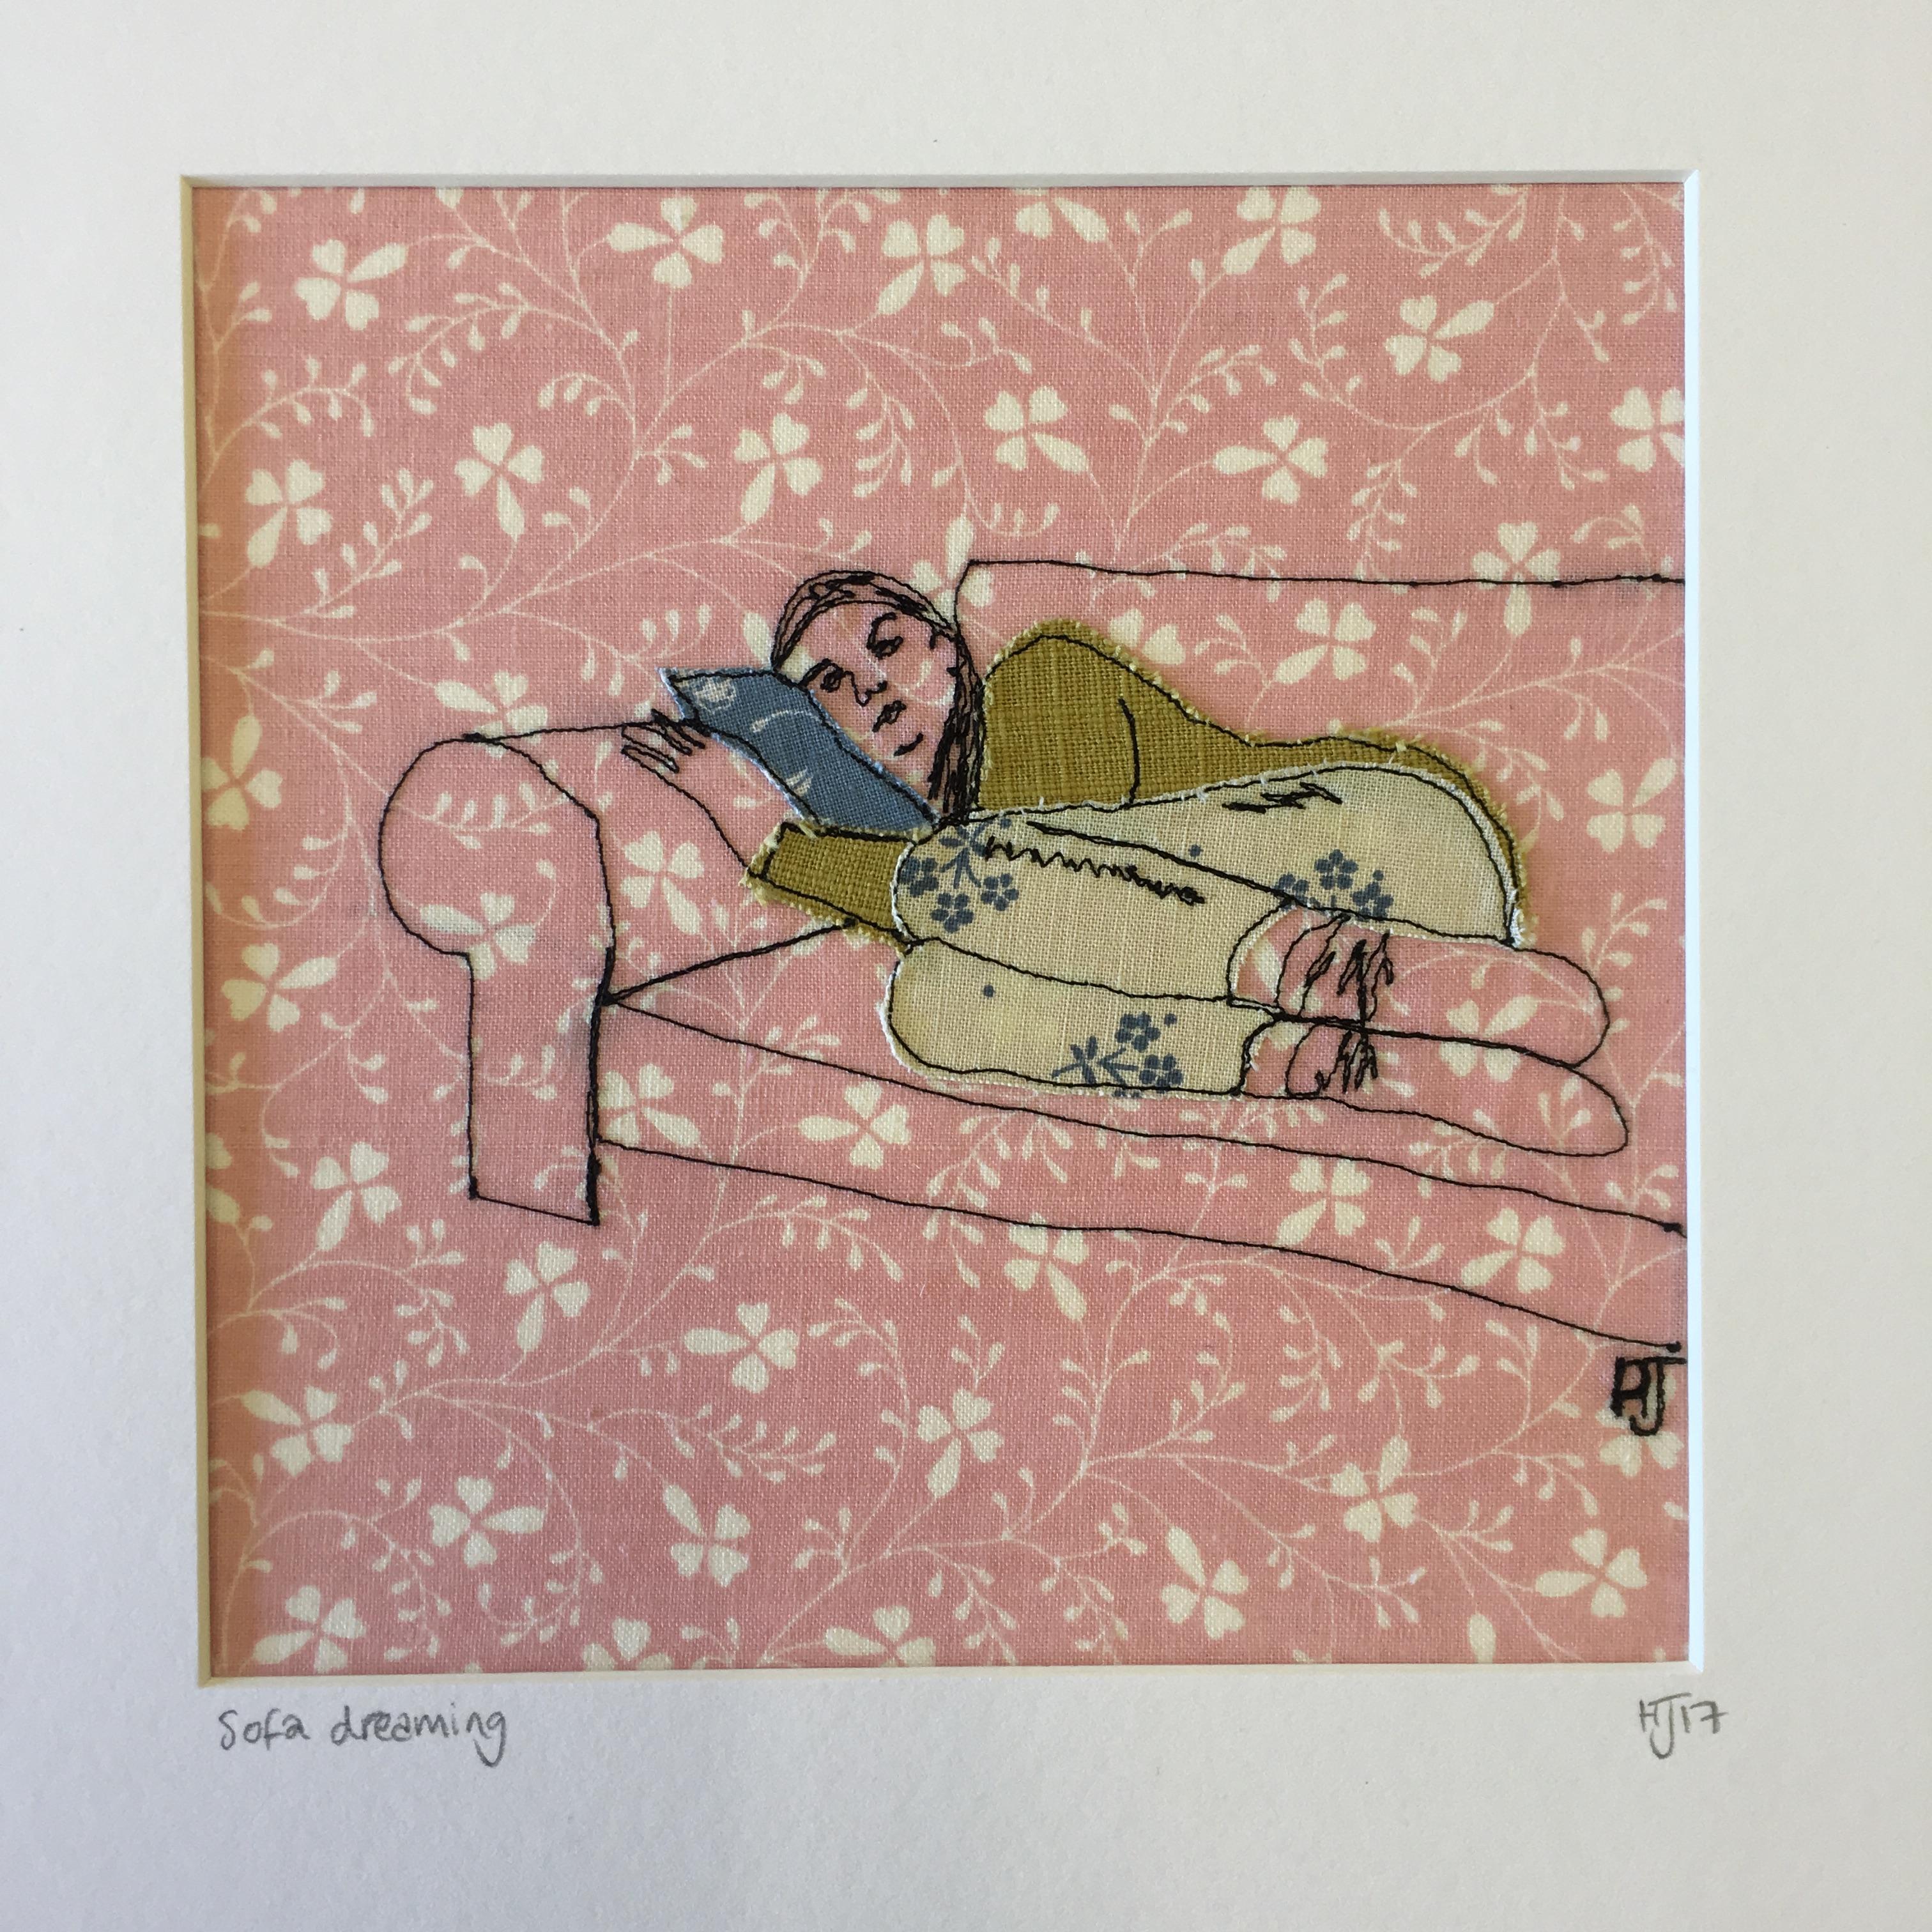 Sofa dreaming